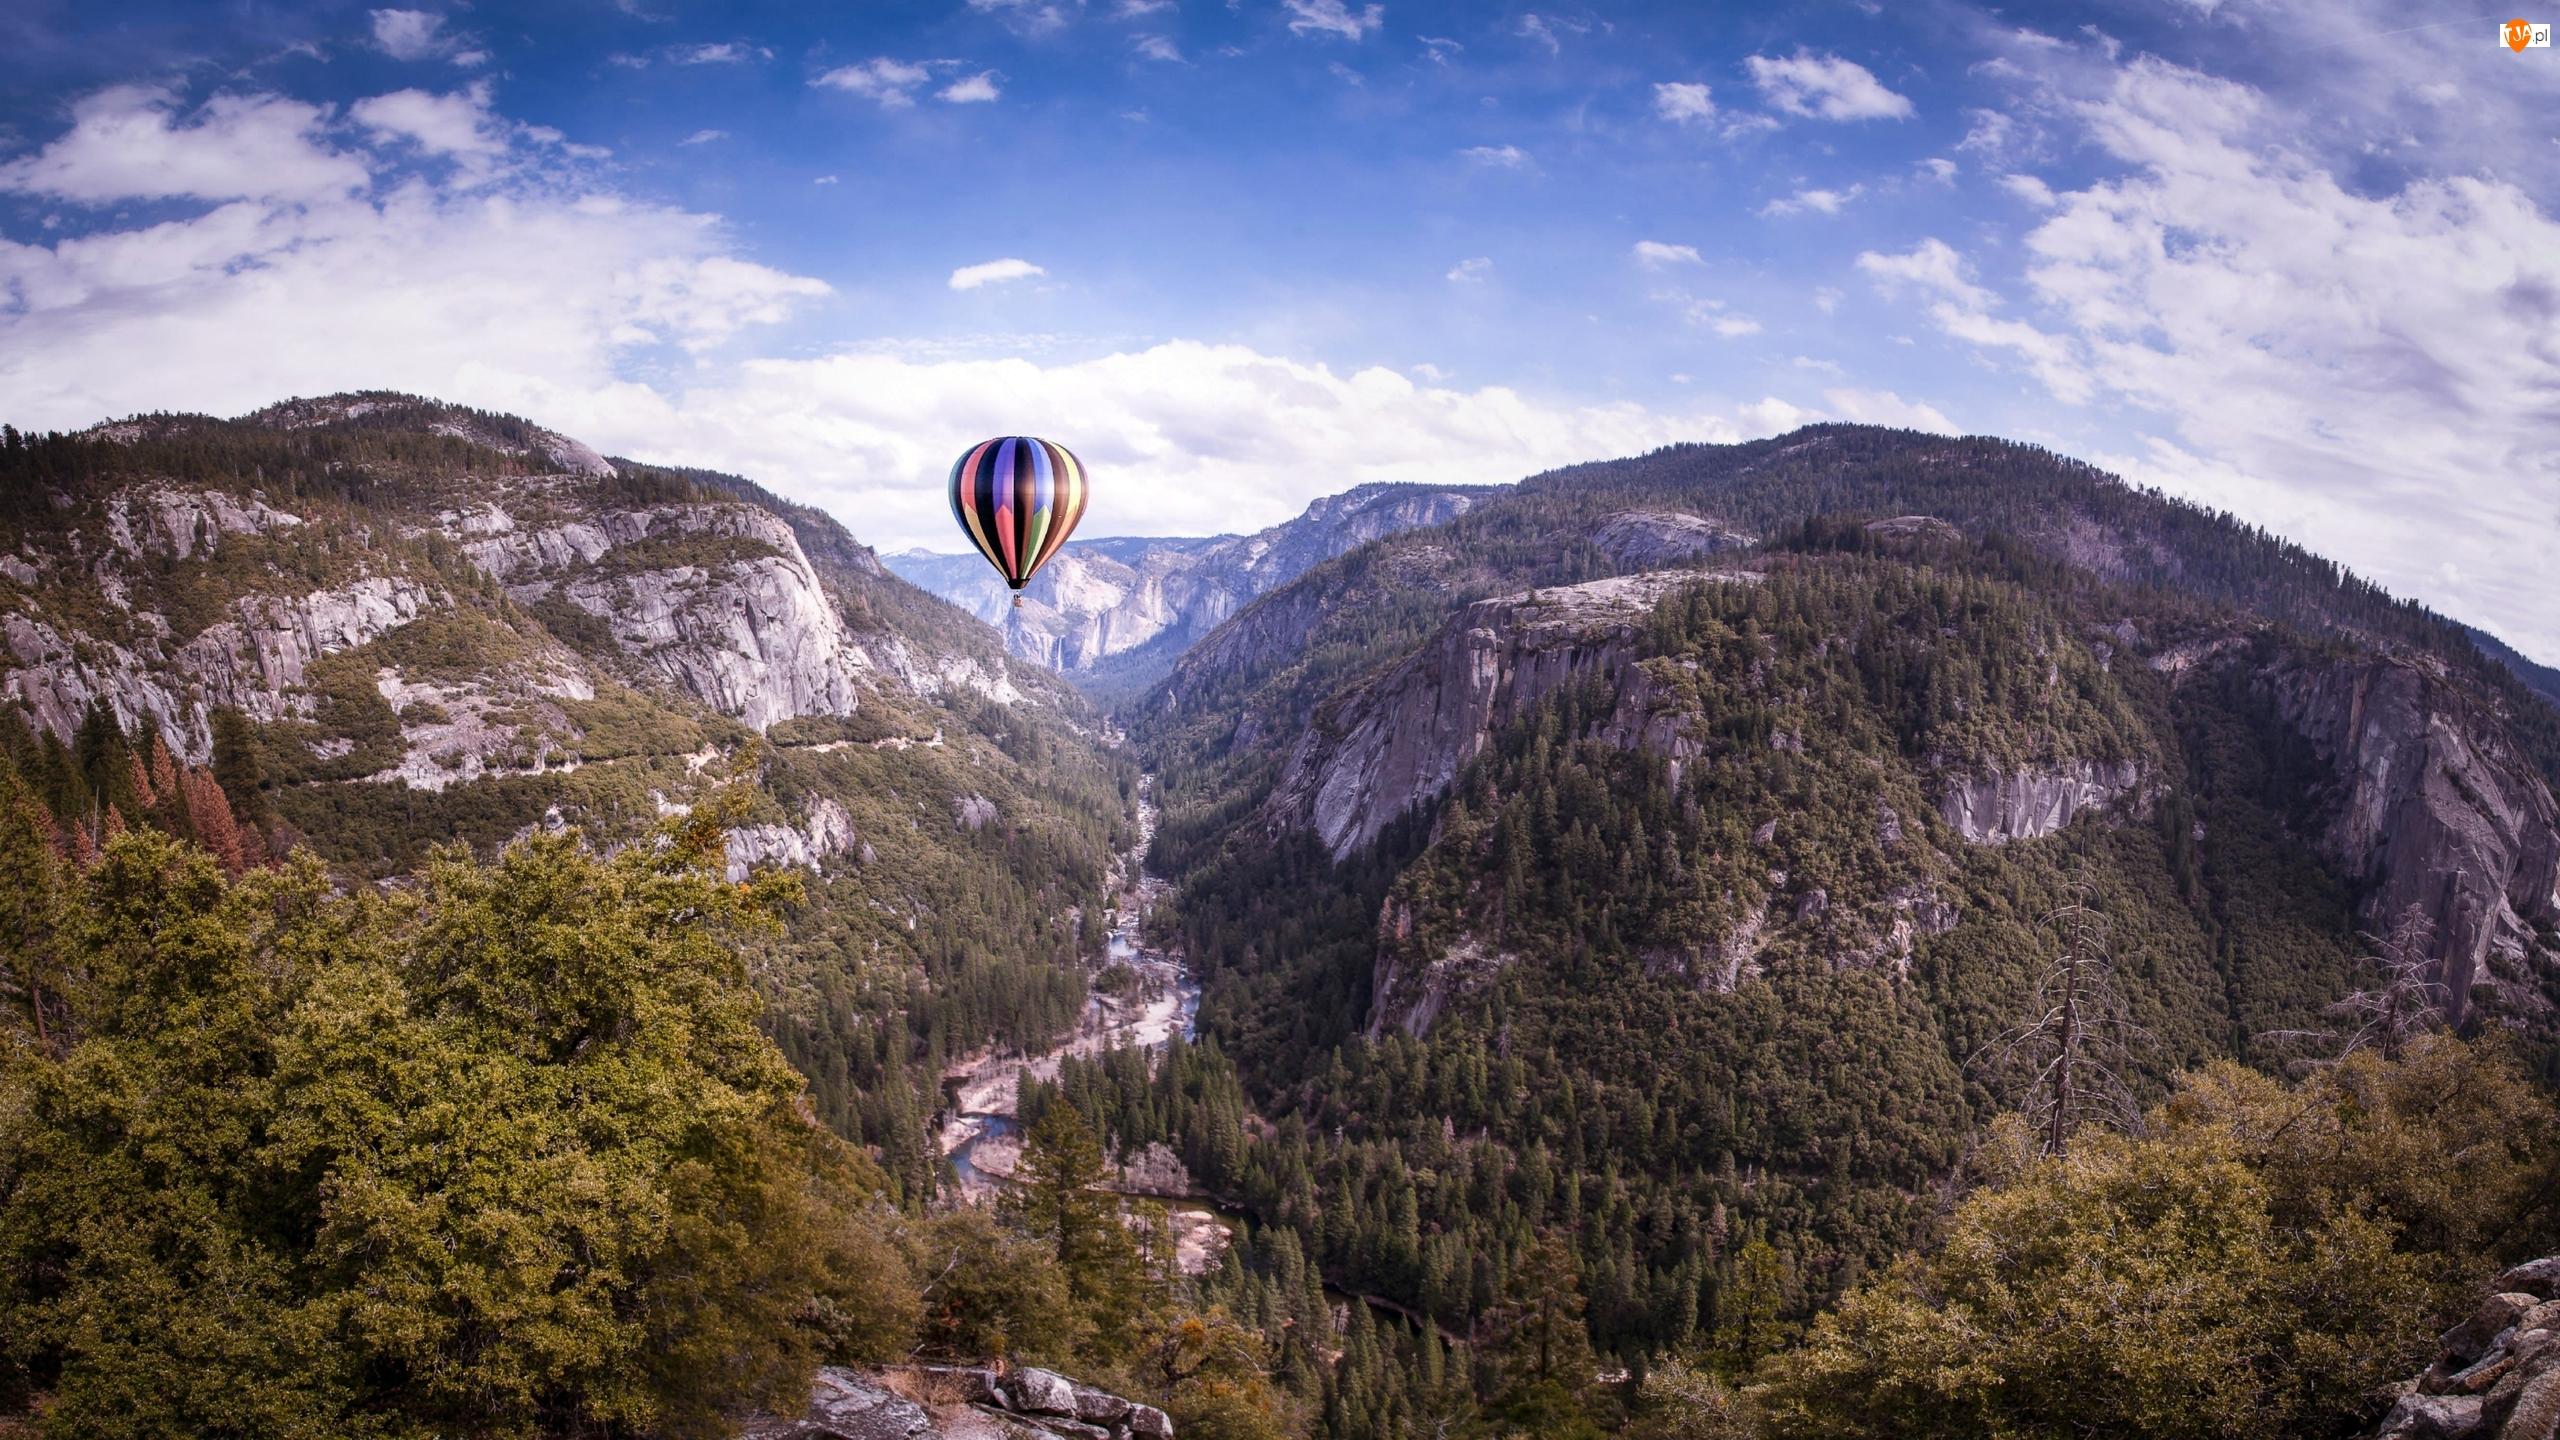 Rzeka, Stany Zjednoczone, Dolina Yosemite Valley, Merced River, Kalifornia, Góry, Balon, Park Narodowy Yosemite